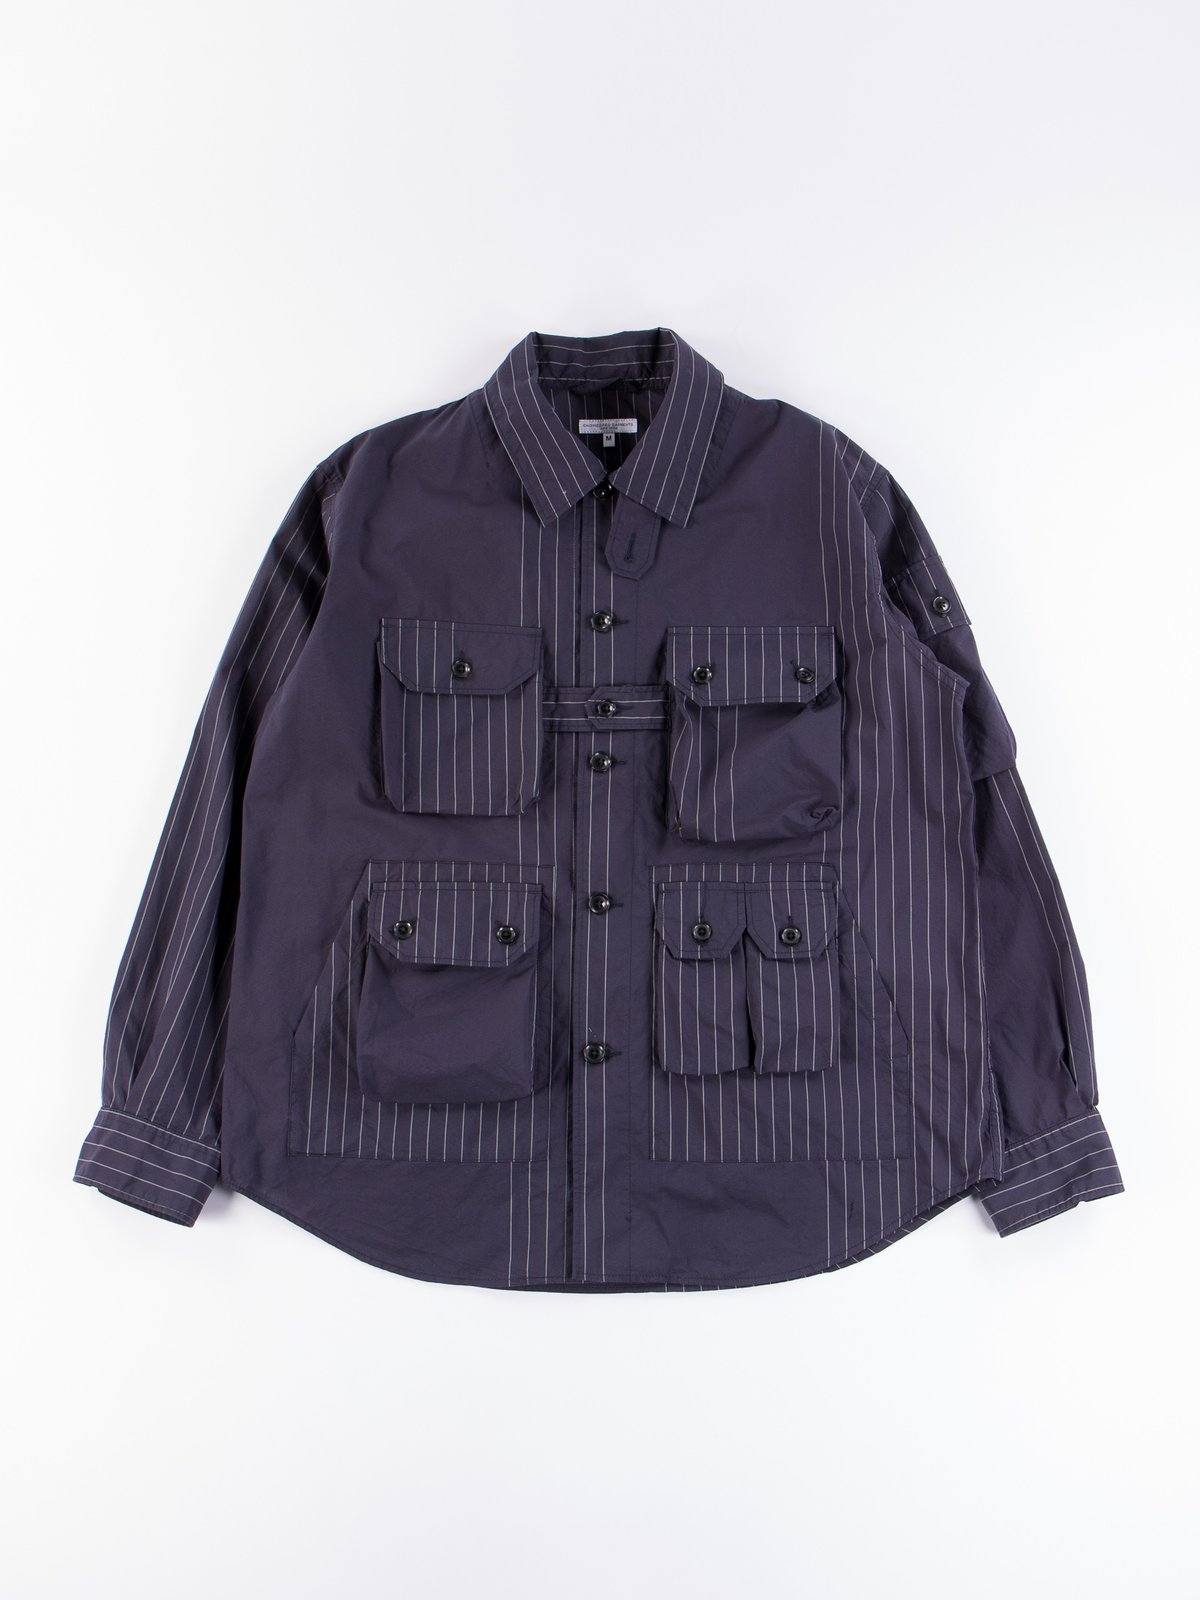 Dark Navy Nyco Gangster Stripe Explorer Shirt Jacket - Image 1